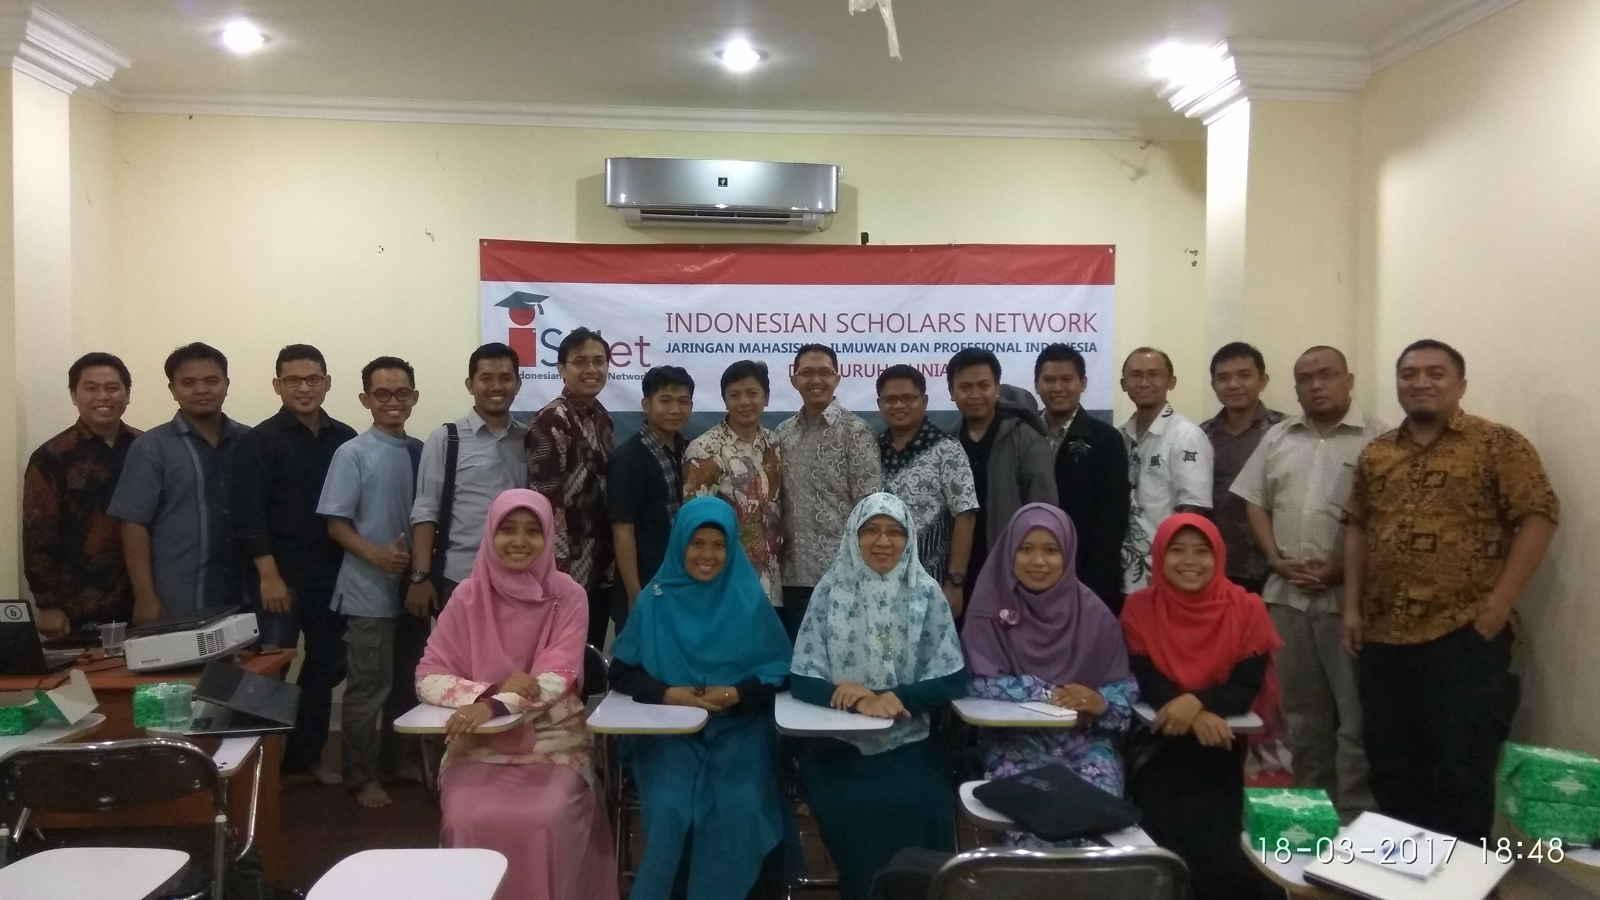 indonesian scholar network